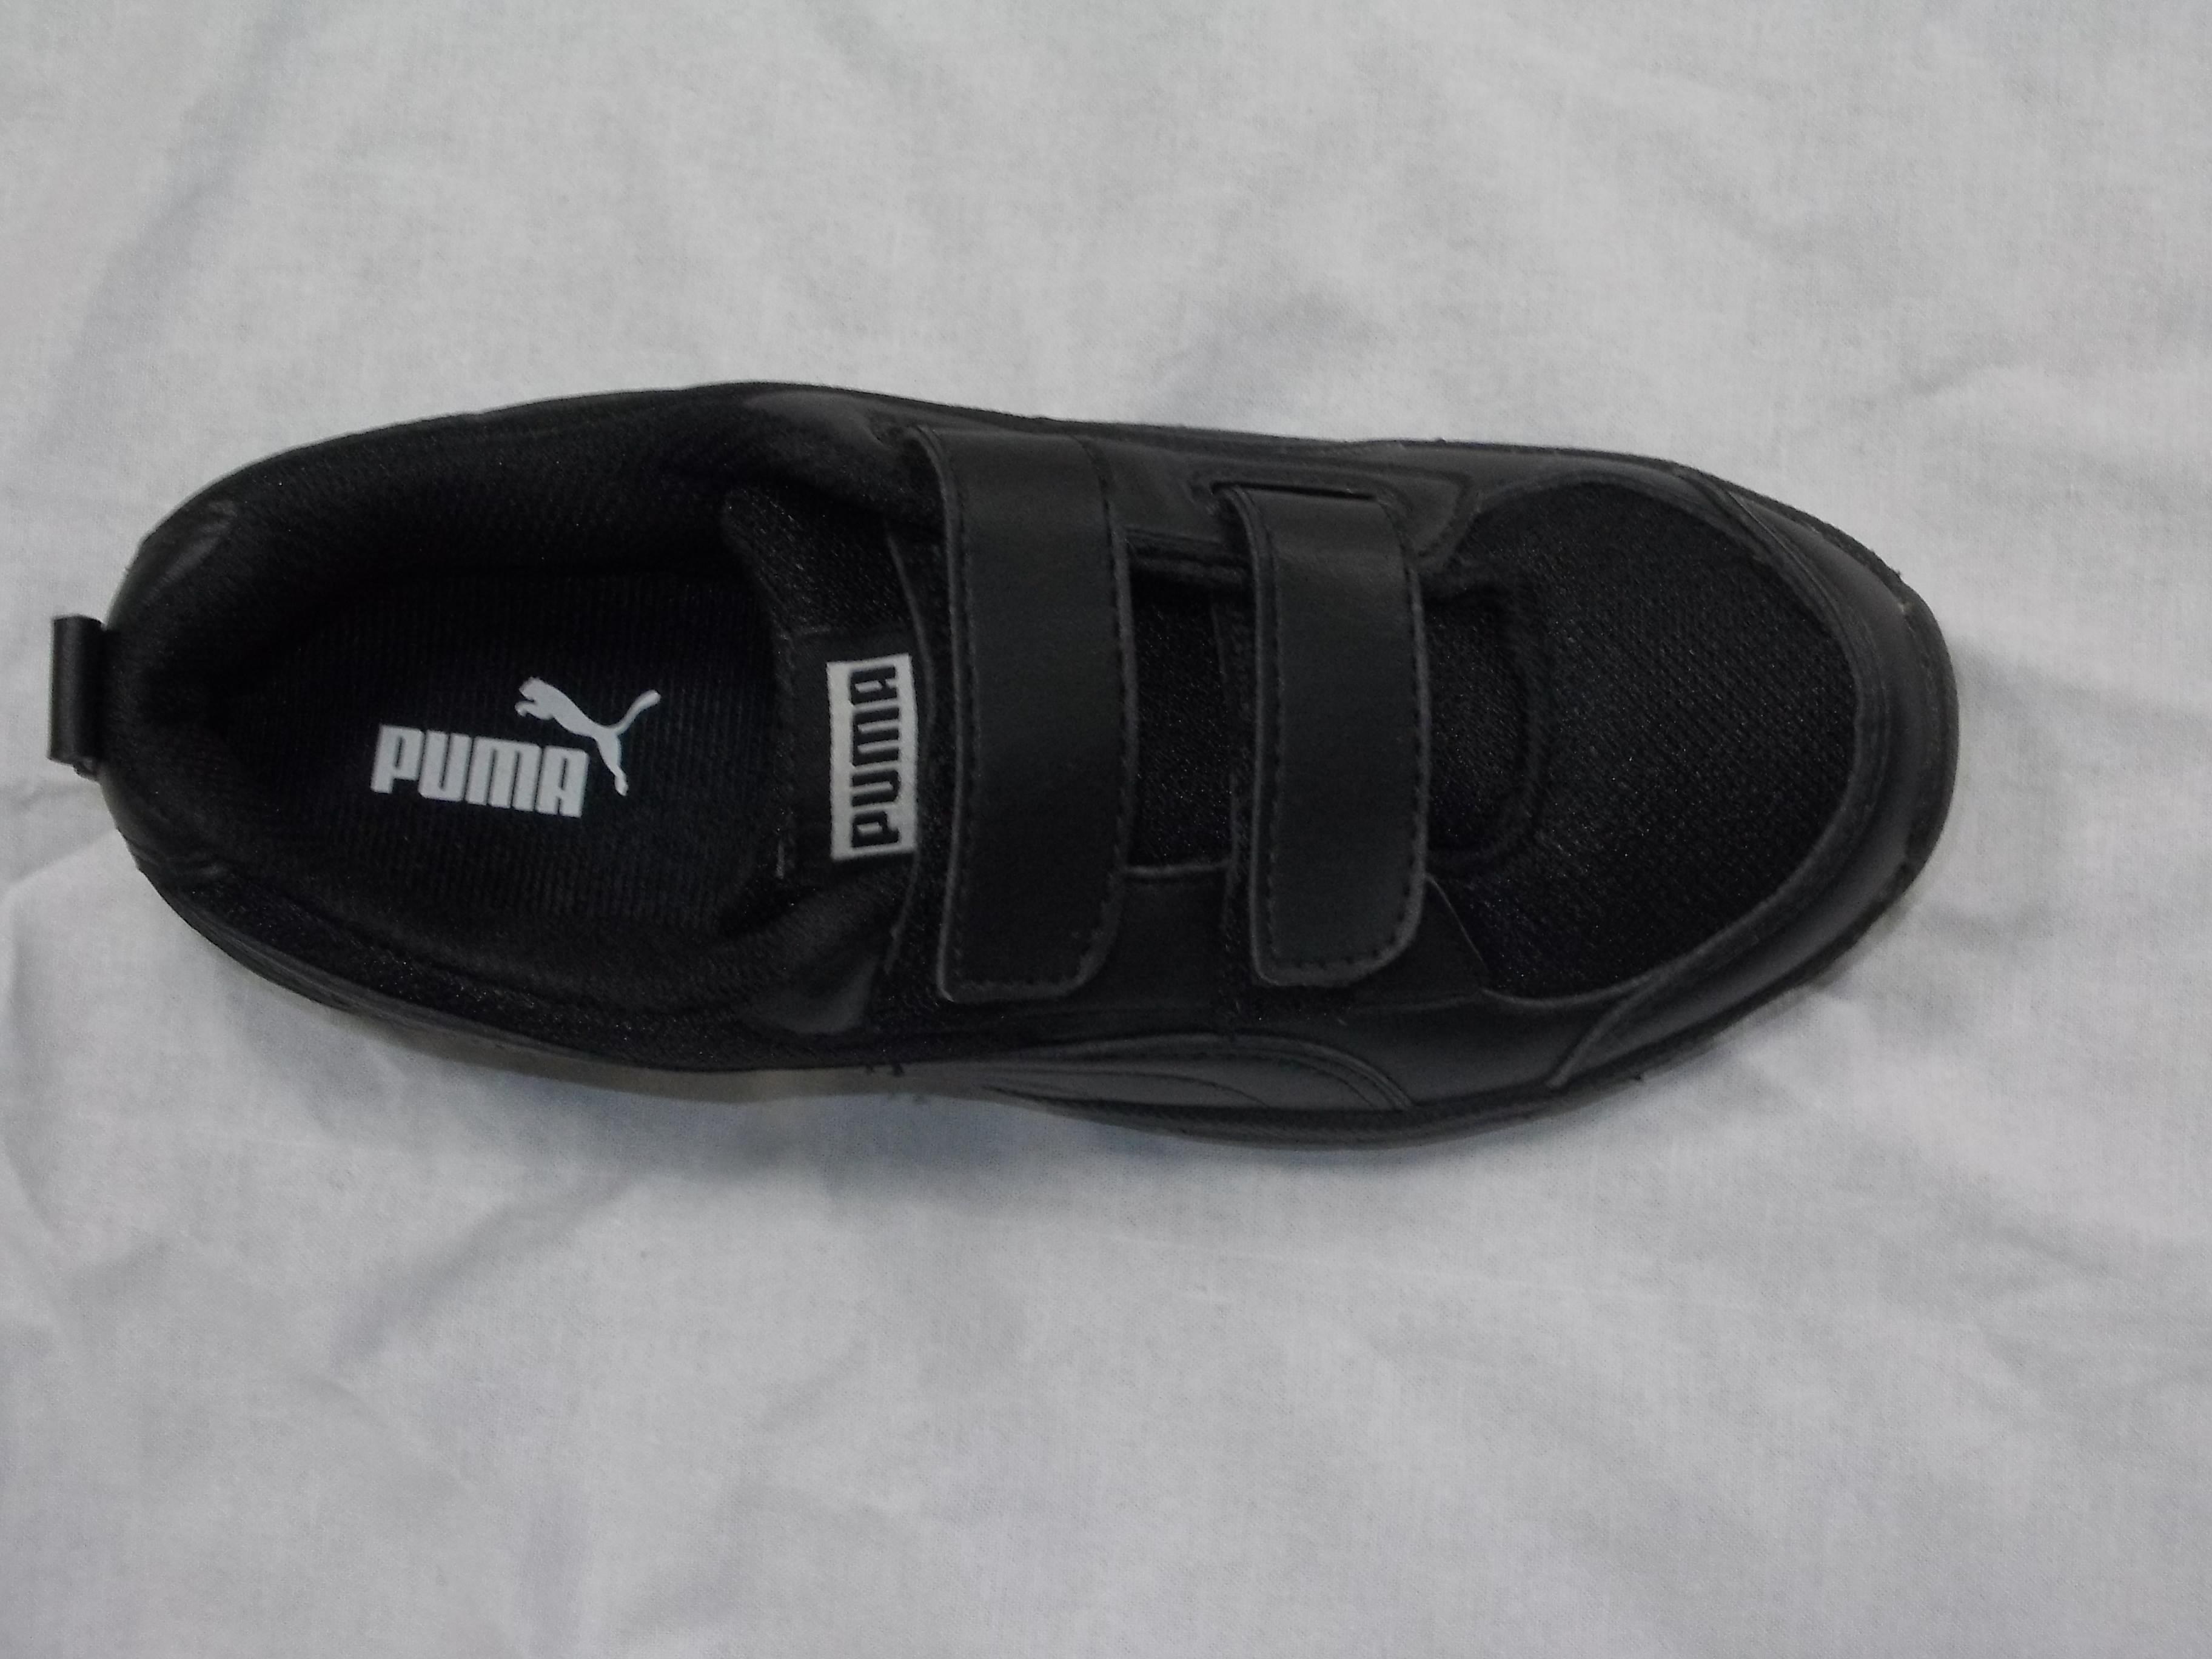 puma school shoes for kids off 60